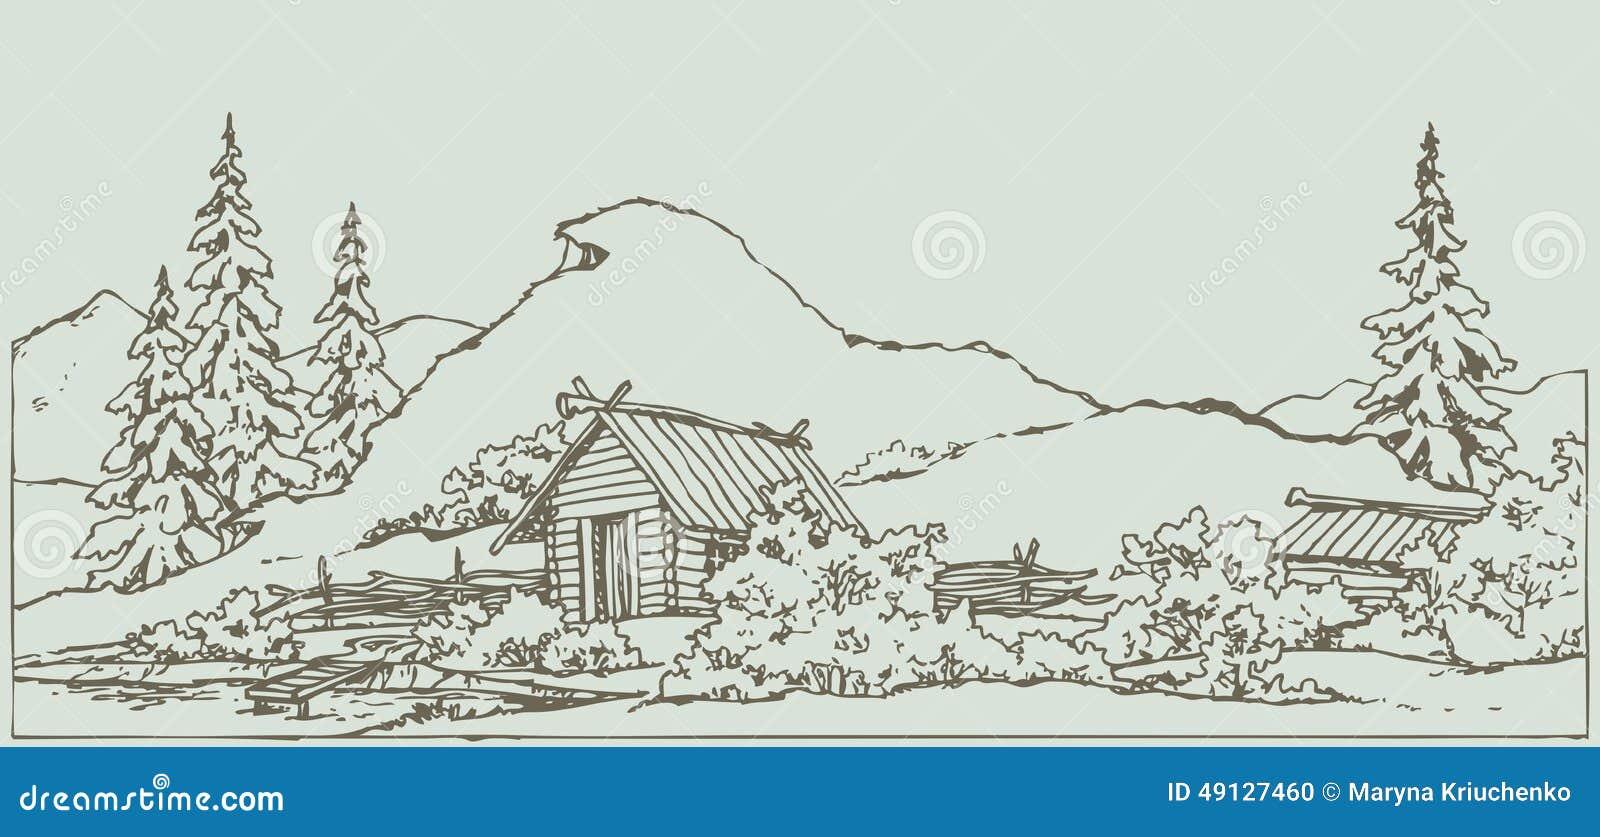 Contour Line Landscape Drawing : Vector drawing ancient rural landscape stock